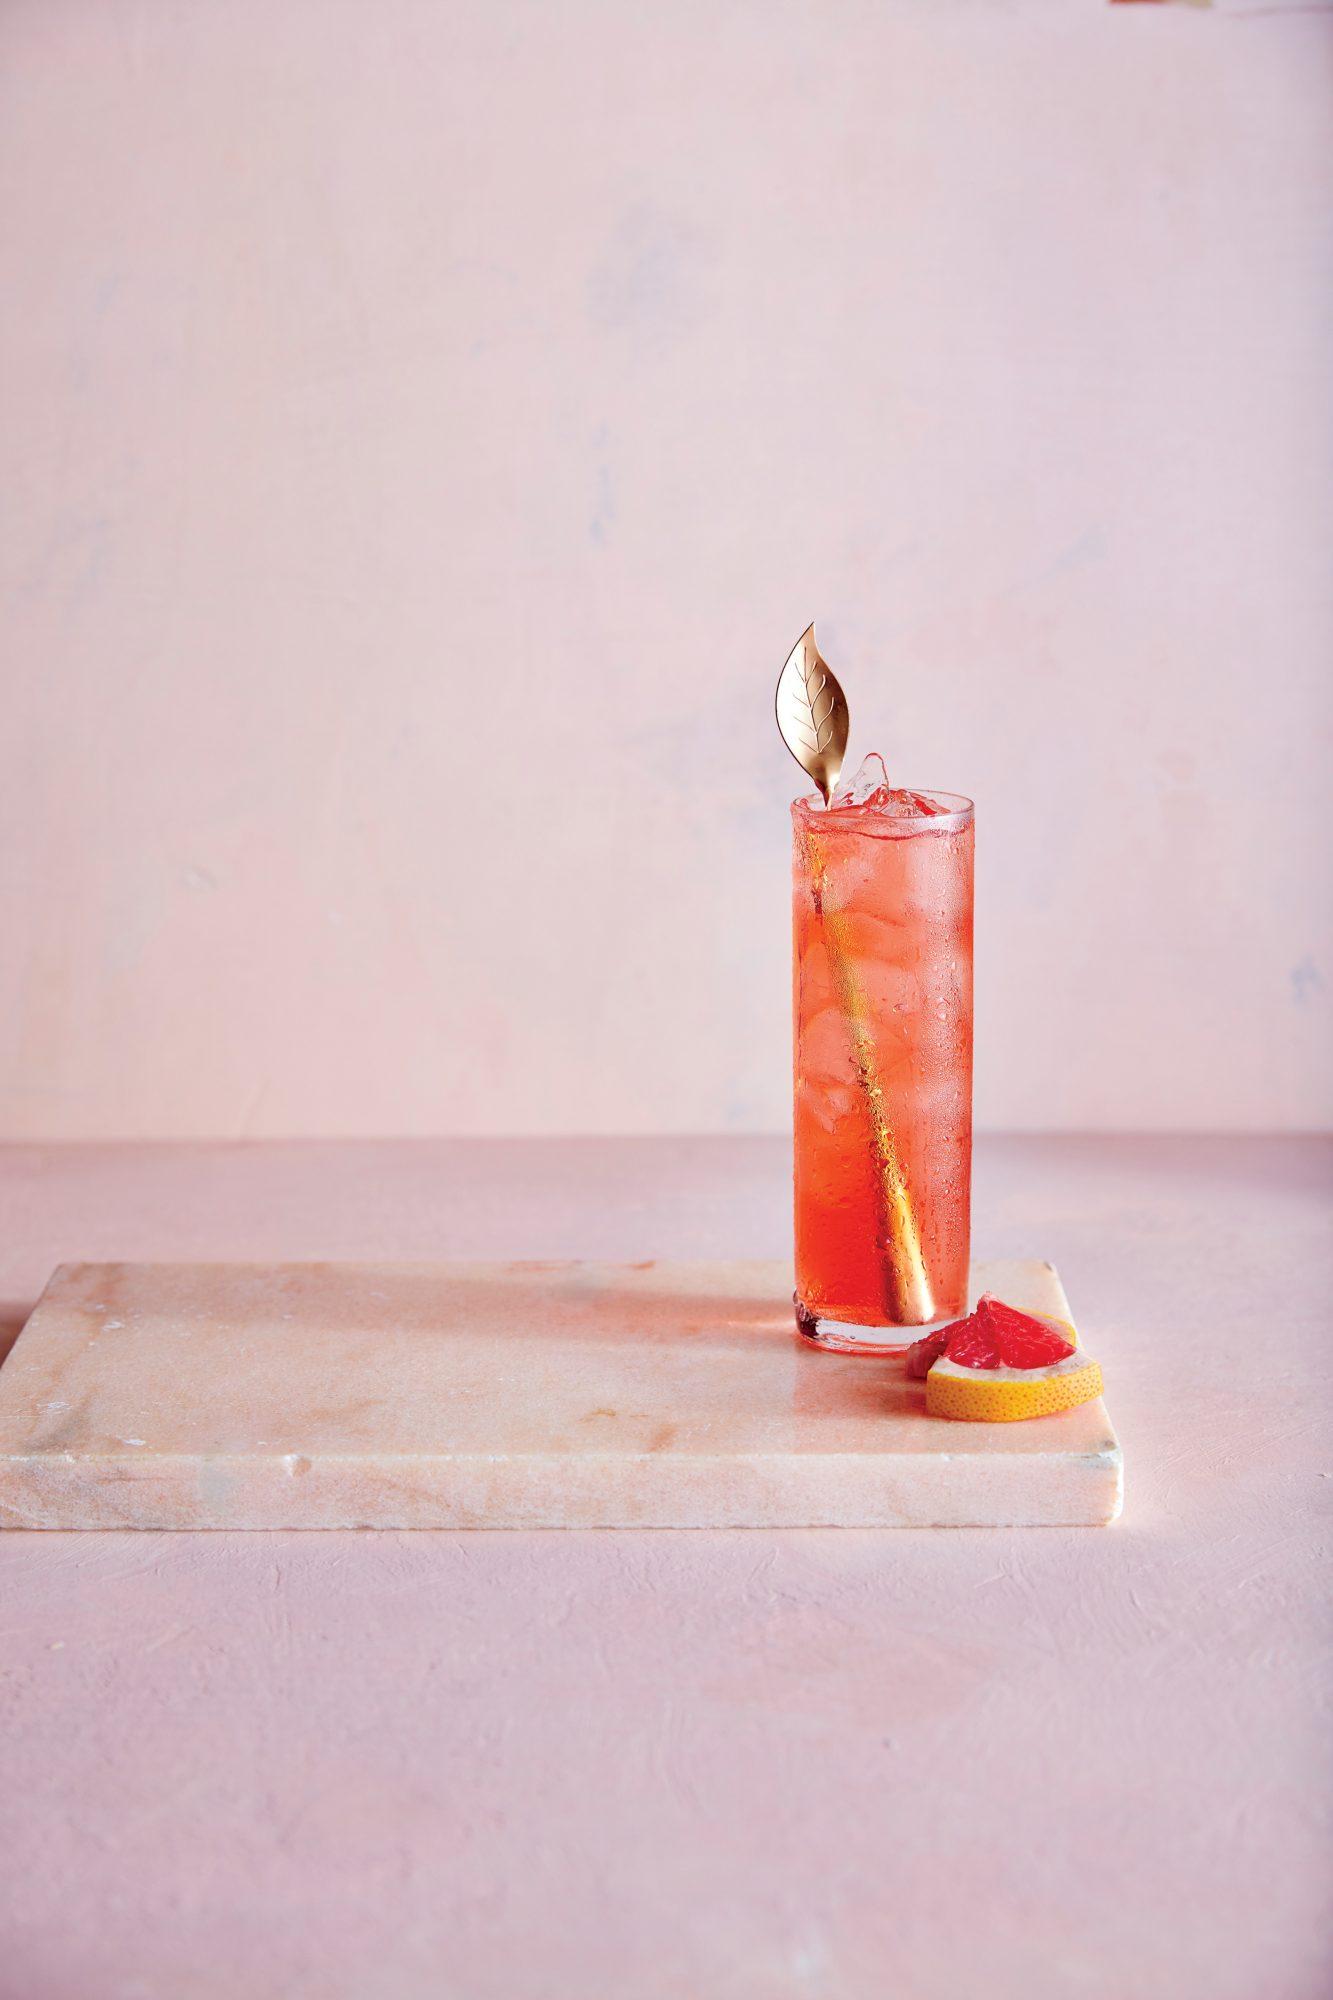 cl-Cachaça, Campari, Lime, and Grapefruit Cocktail